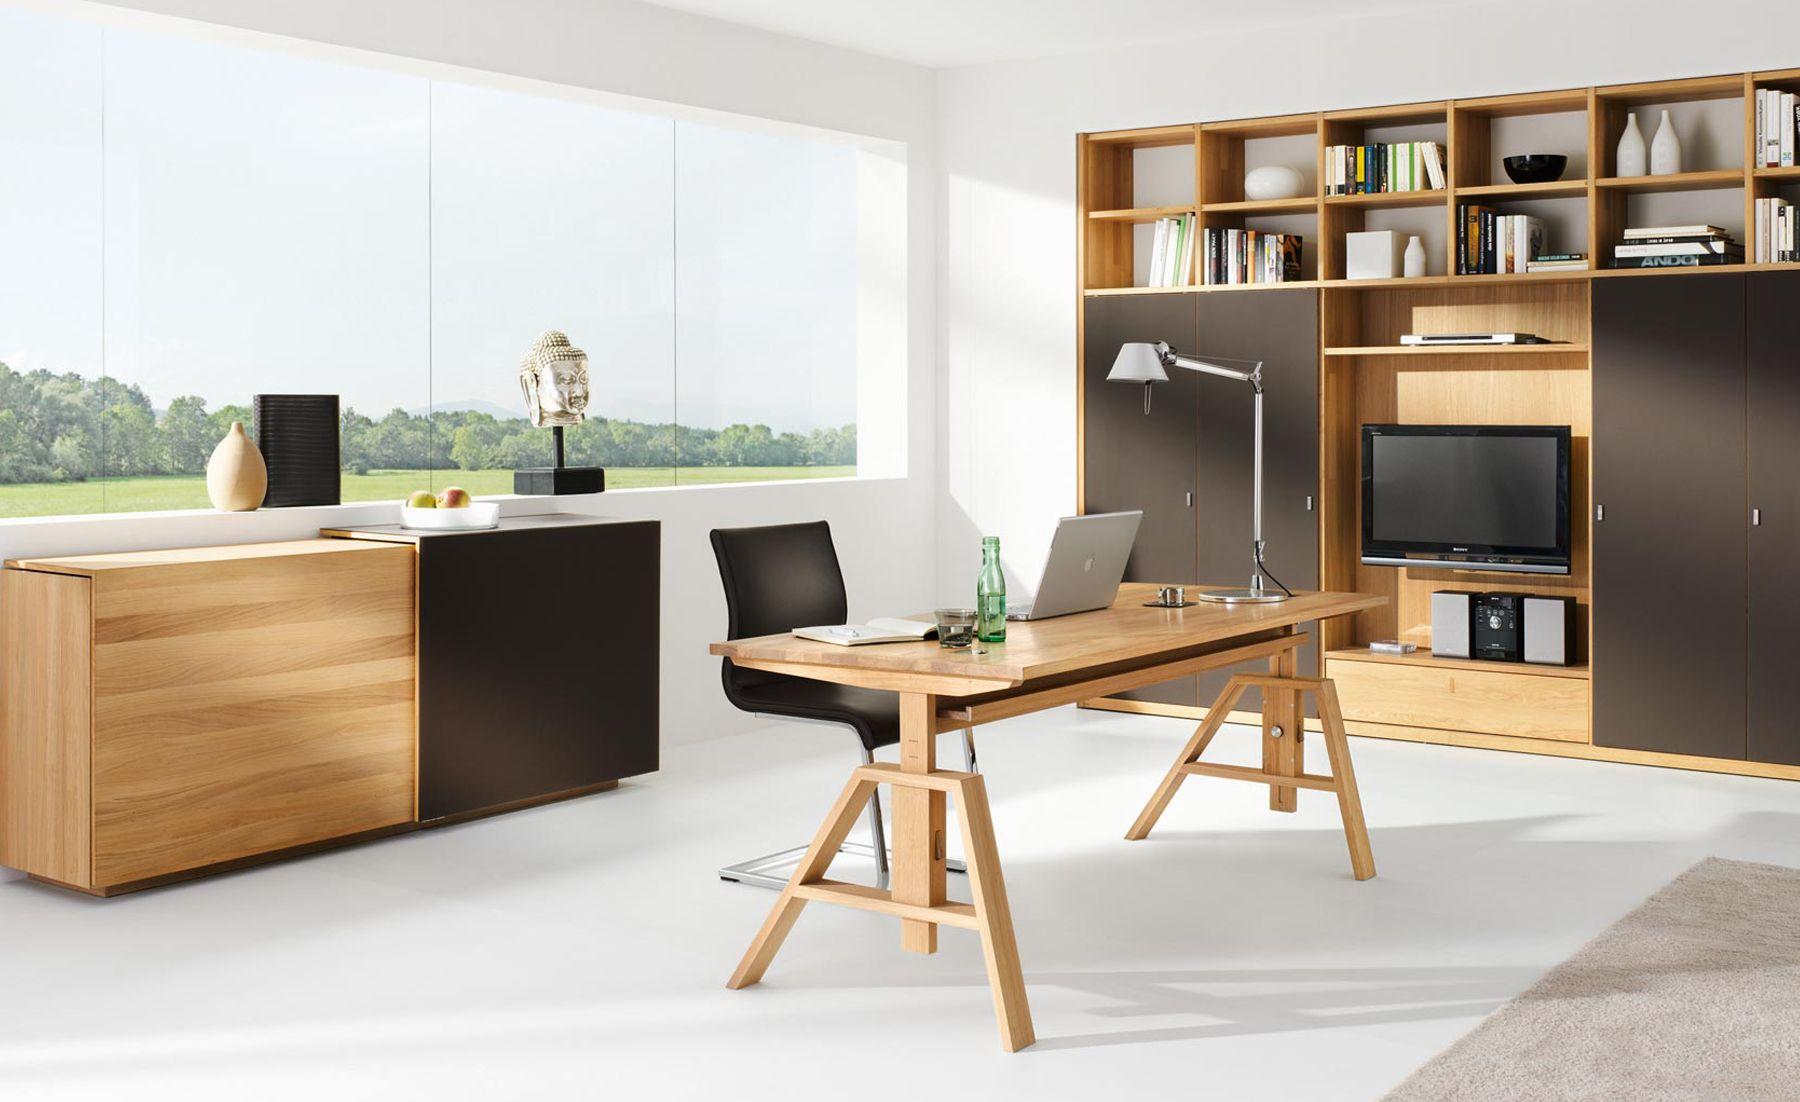 arbeiten m bel sch fer gmbh althengstett. Black Bedroom Furniture Sets. Home Design Ideas